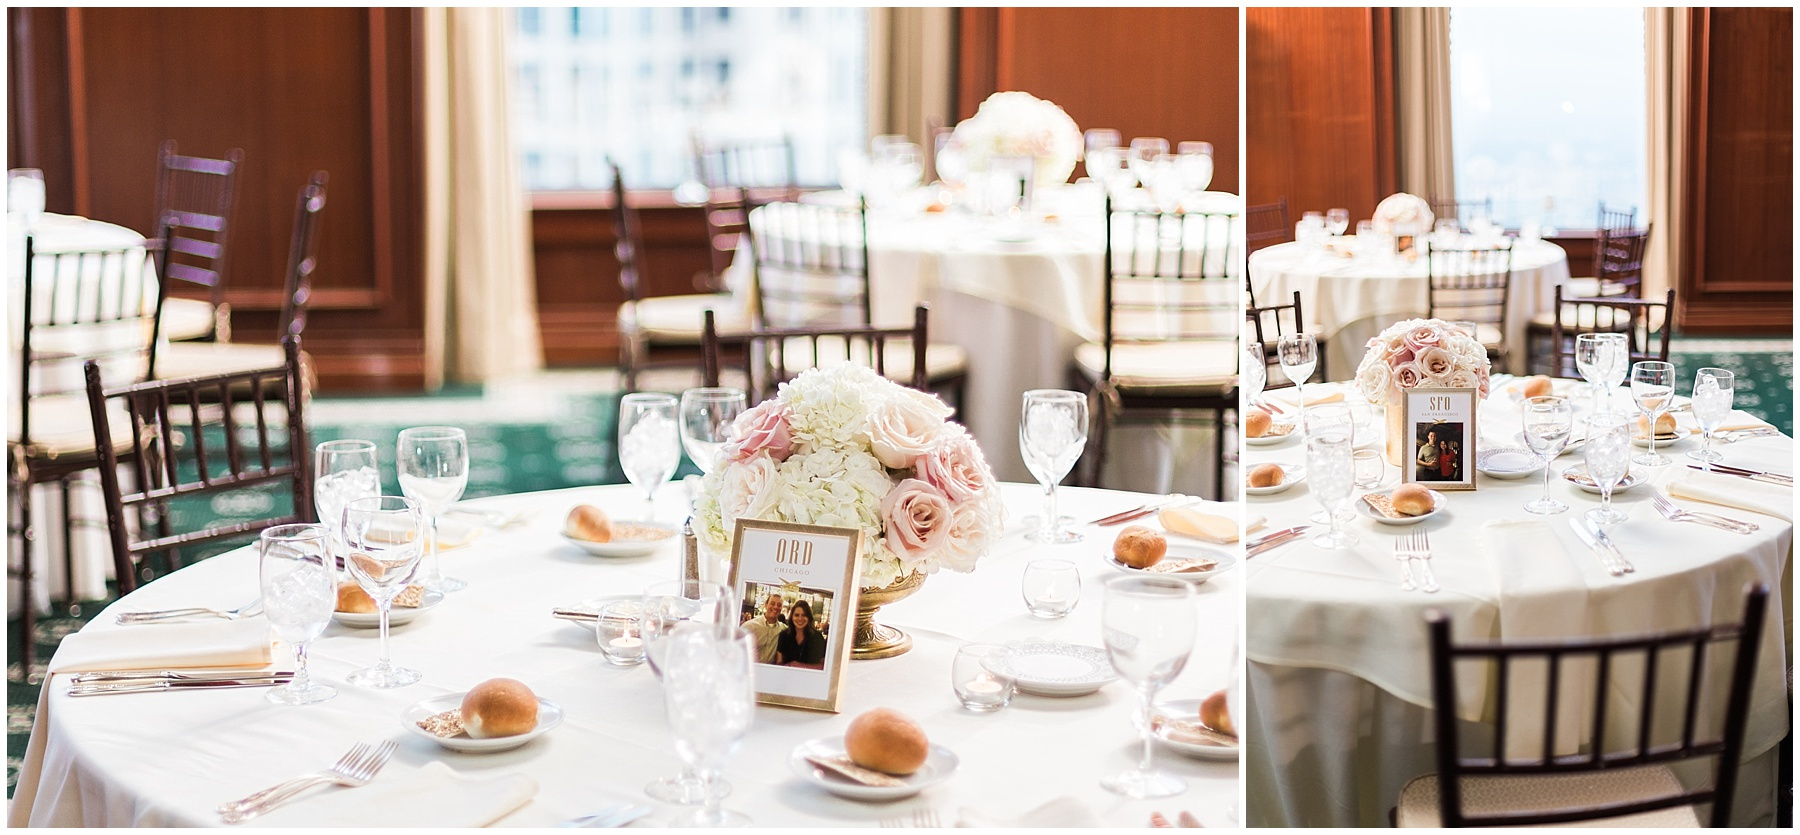 Charlotte City Club Wedding,St. Peter's Catholic Church Wedding,Uptown Charlotte Wedding,